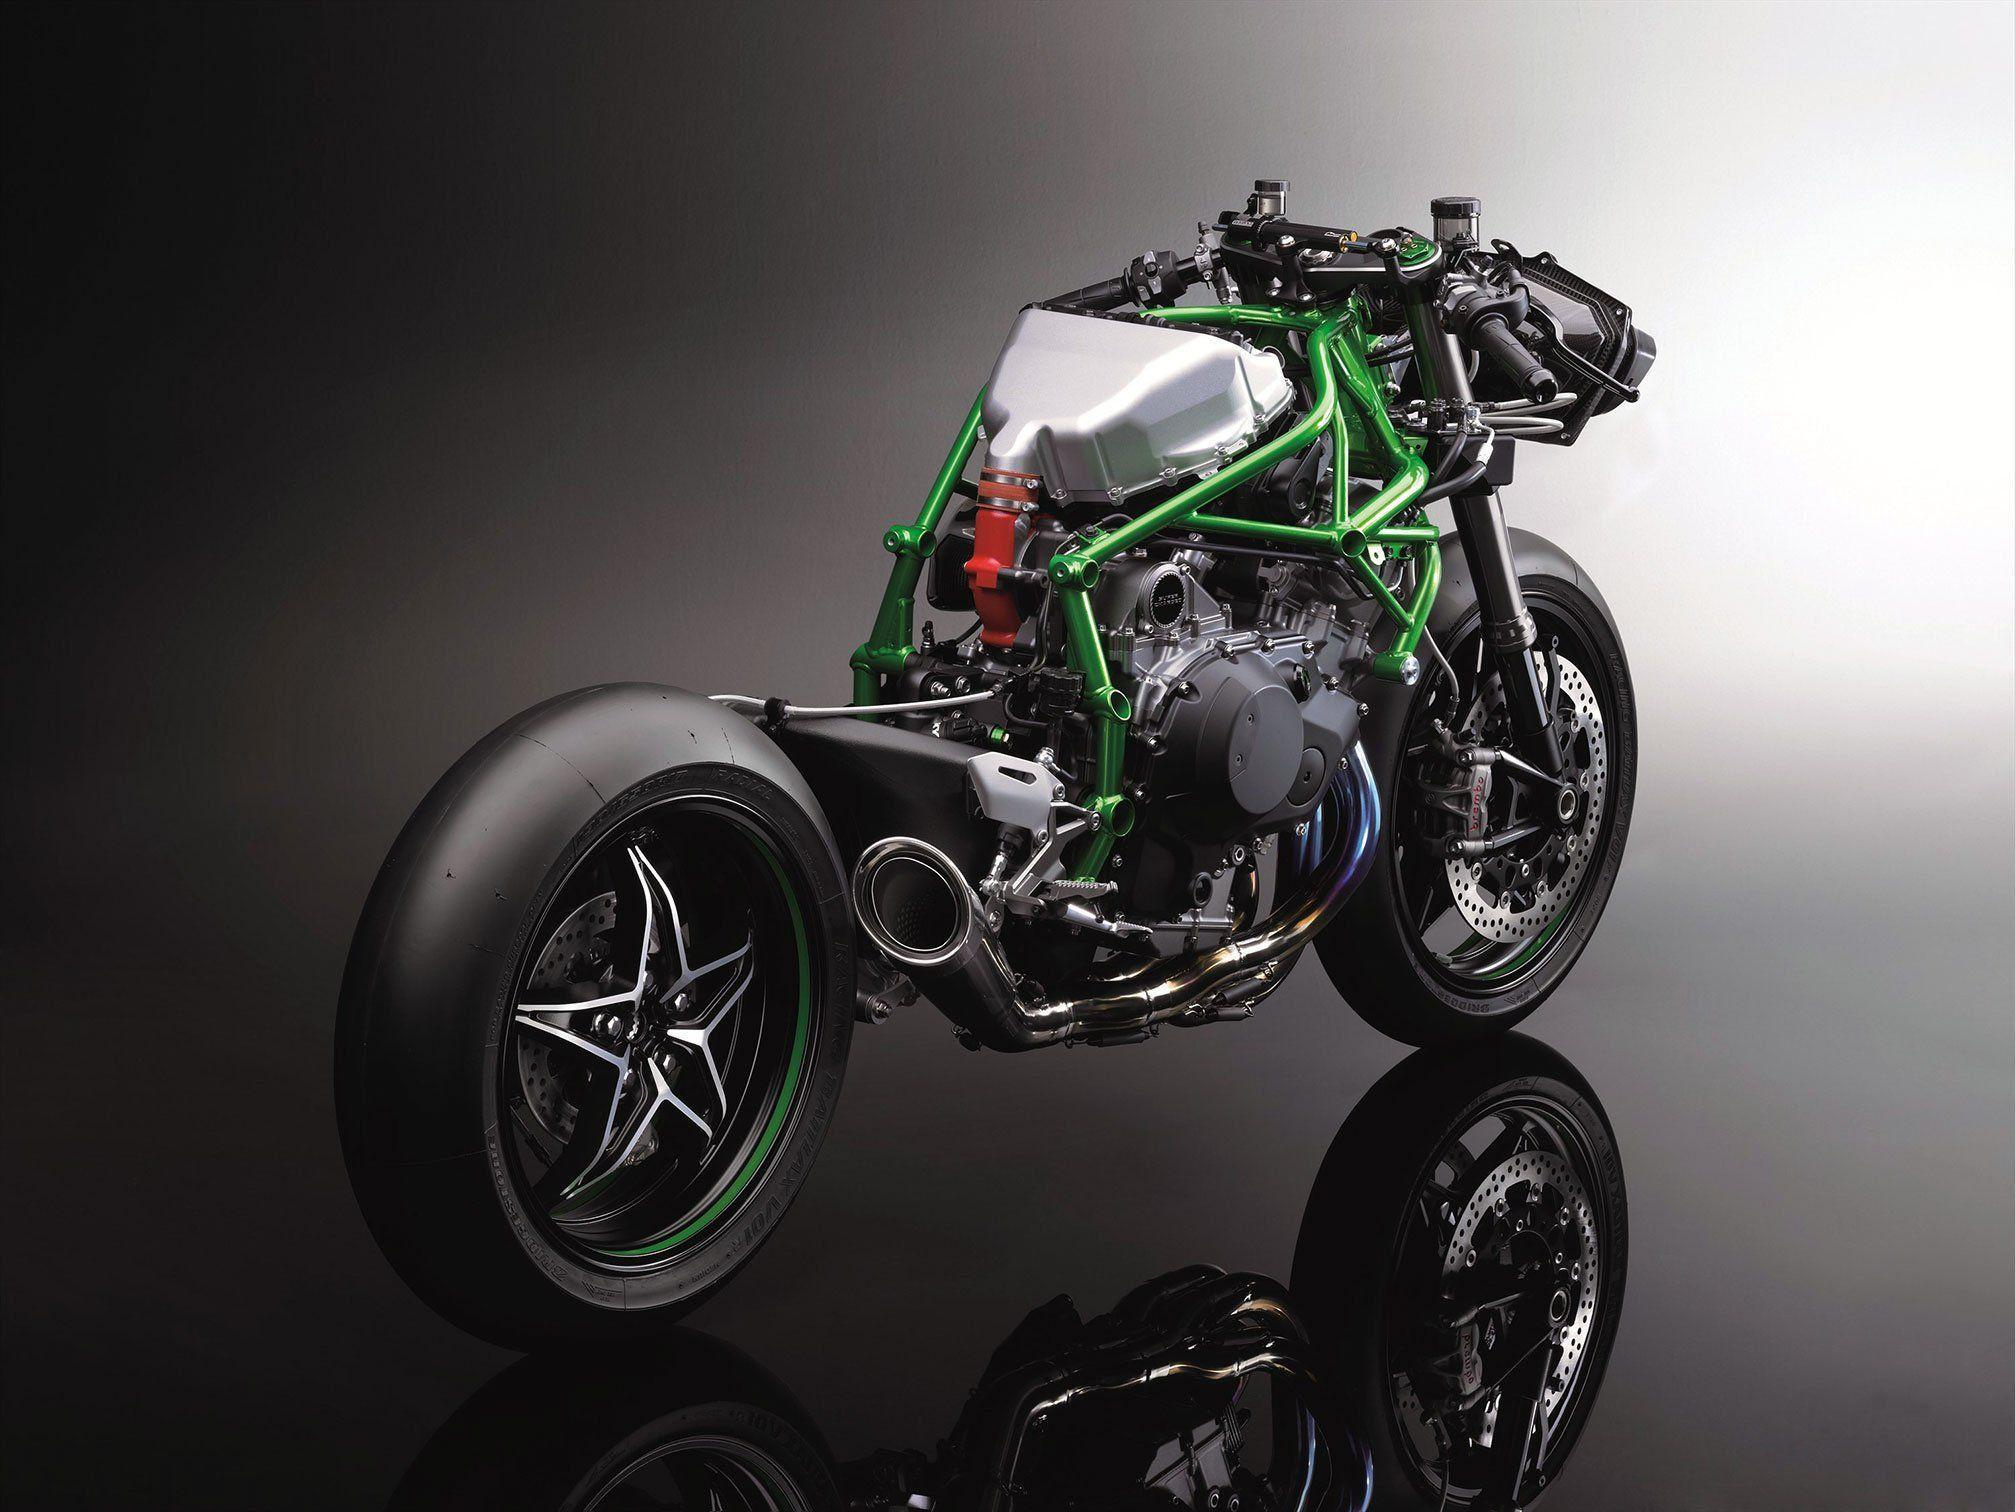 2015 Kawasaki Ninja H2R Supercharged wallpaper | 2015x1512 ...